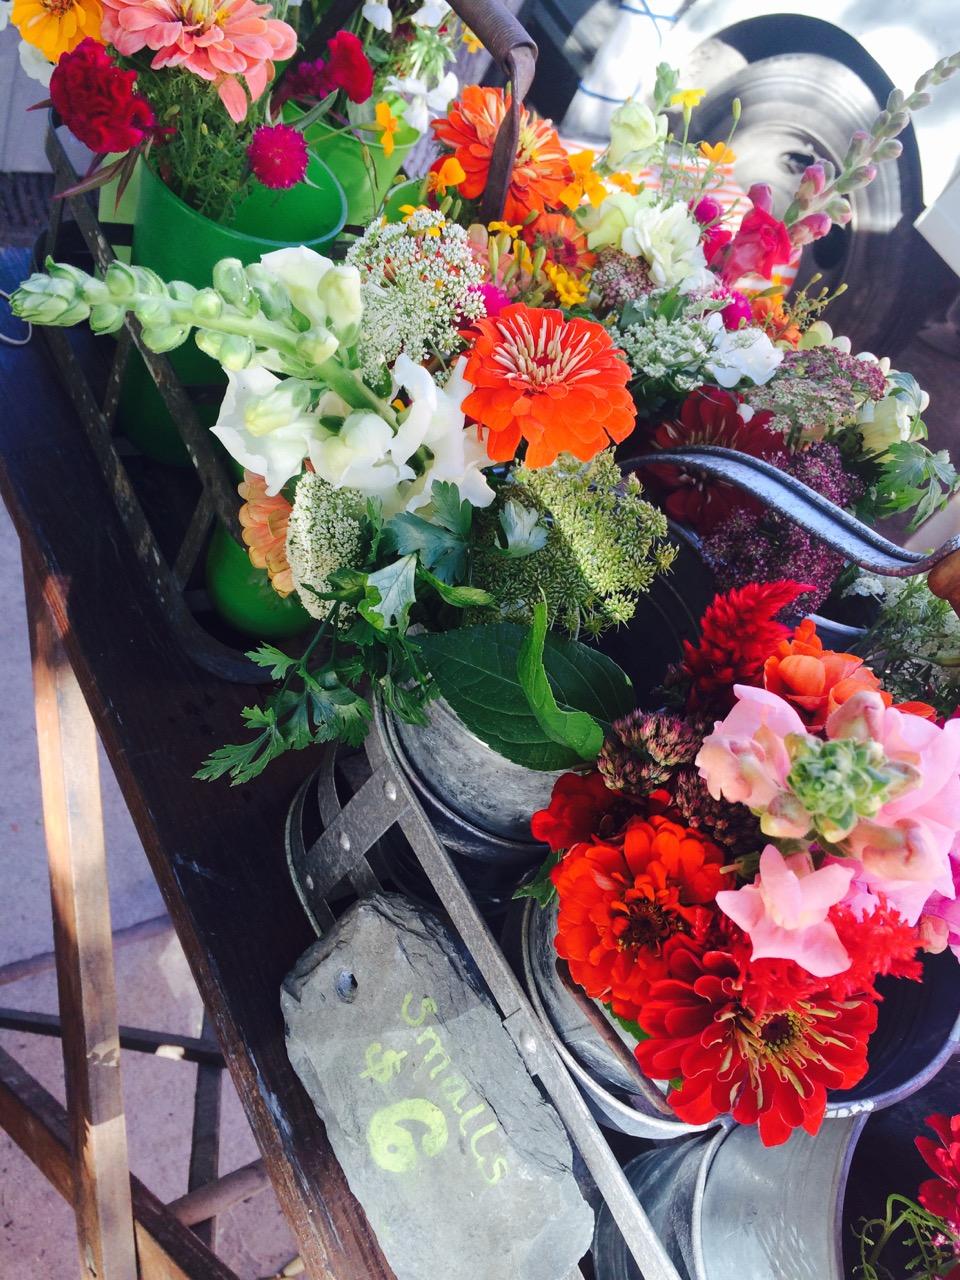 Flowers at the weekend Farmers' Market off Church Street in downtown Burlington.